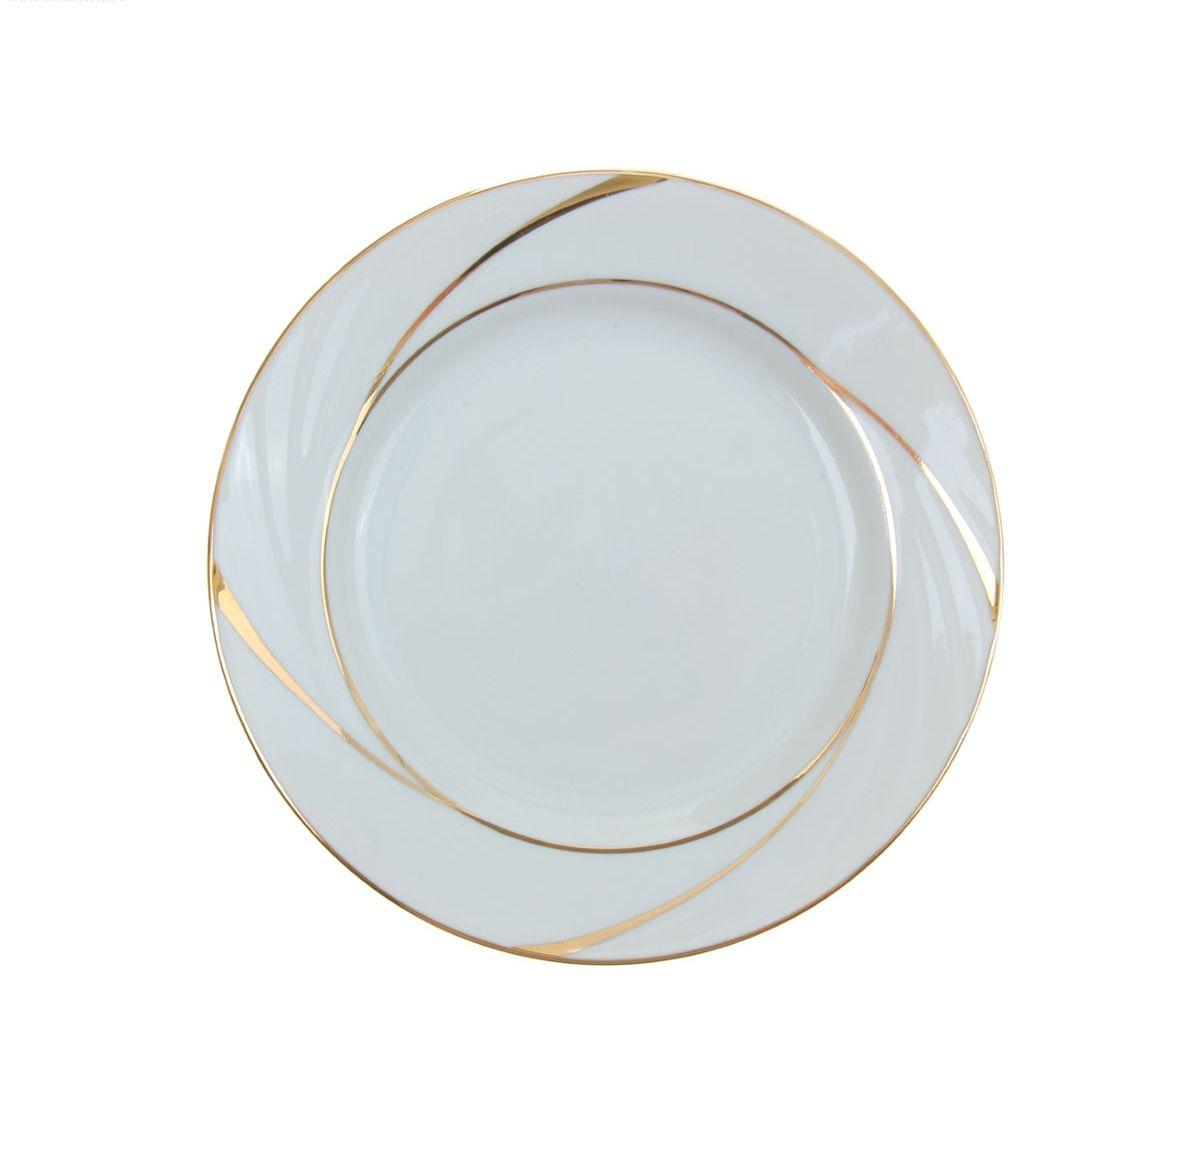 Тарелка мелкая Голубка. Бомонд, диаметр 17,5 см селедочница голубка ассорти длина 25 см